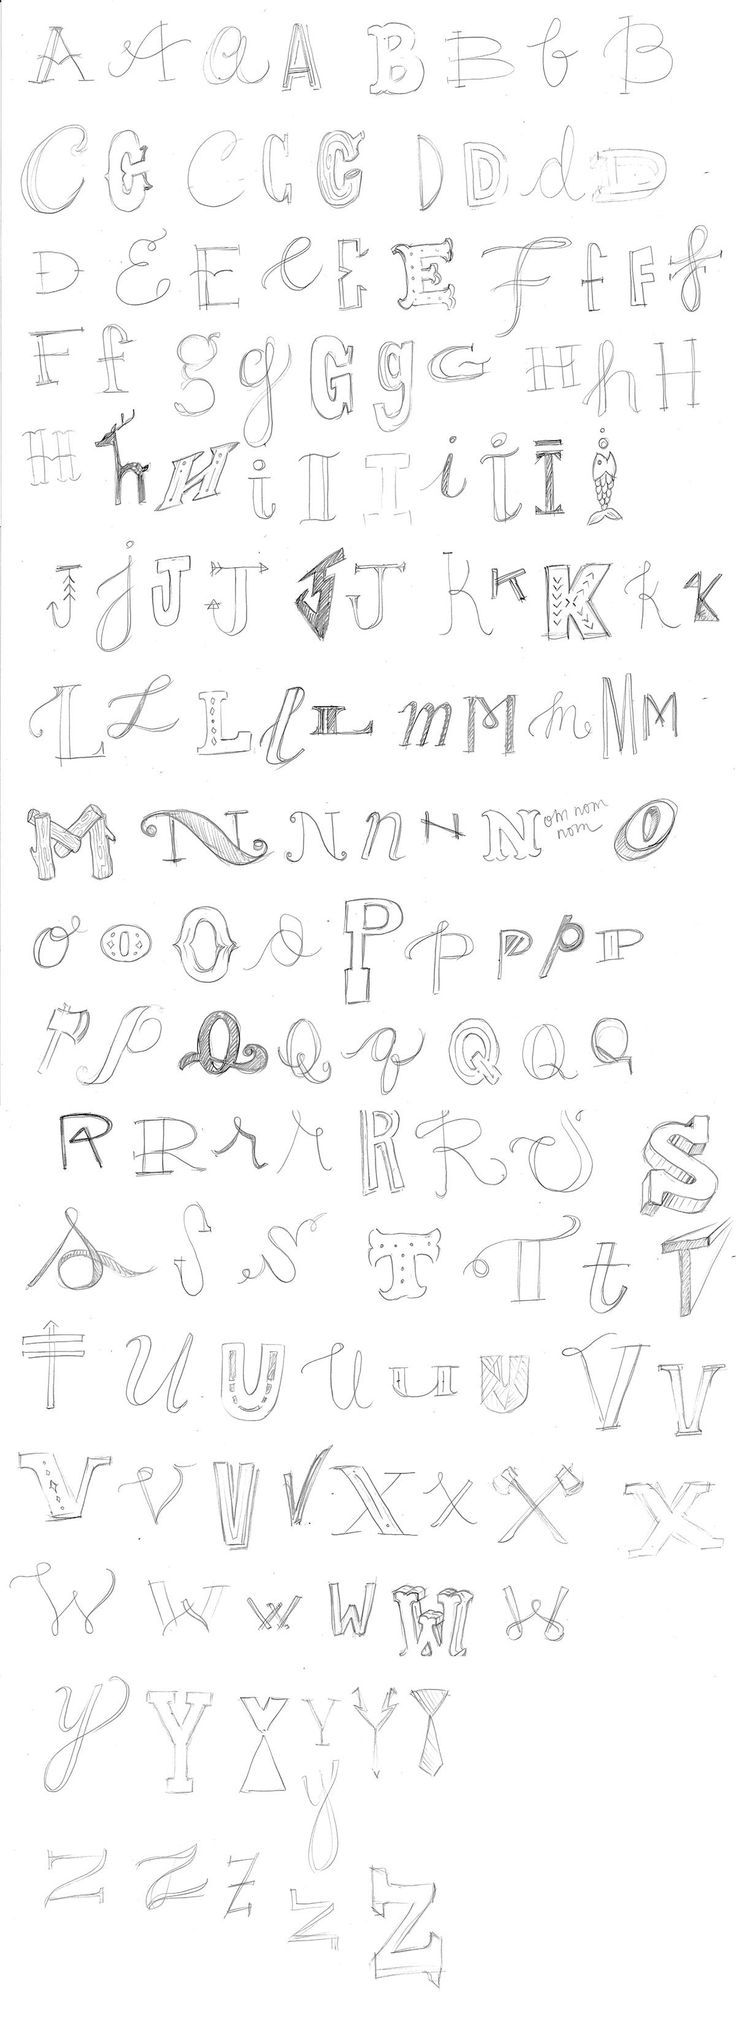 Hand-Lettering | Practice the Alphabet! by Angela Tomson - Skillshare